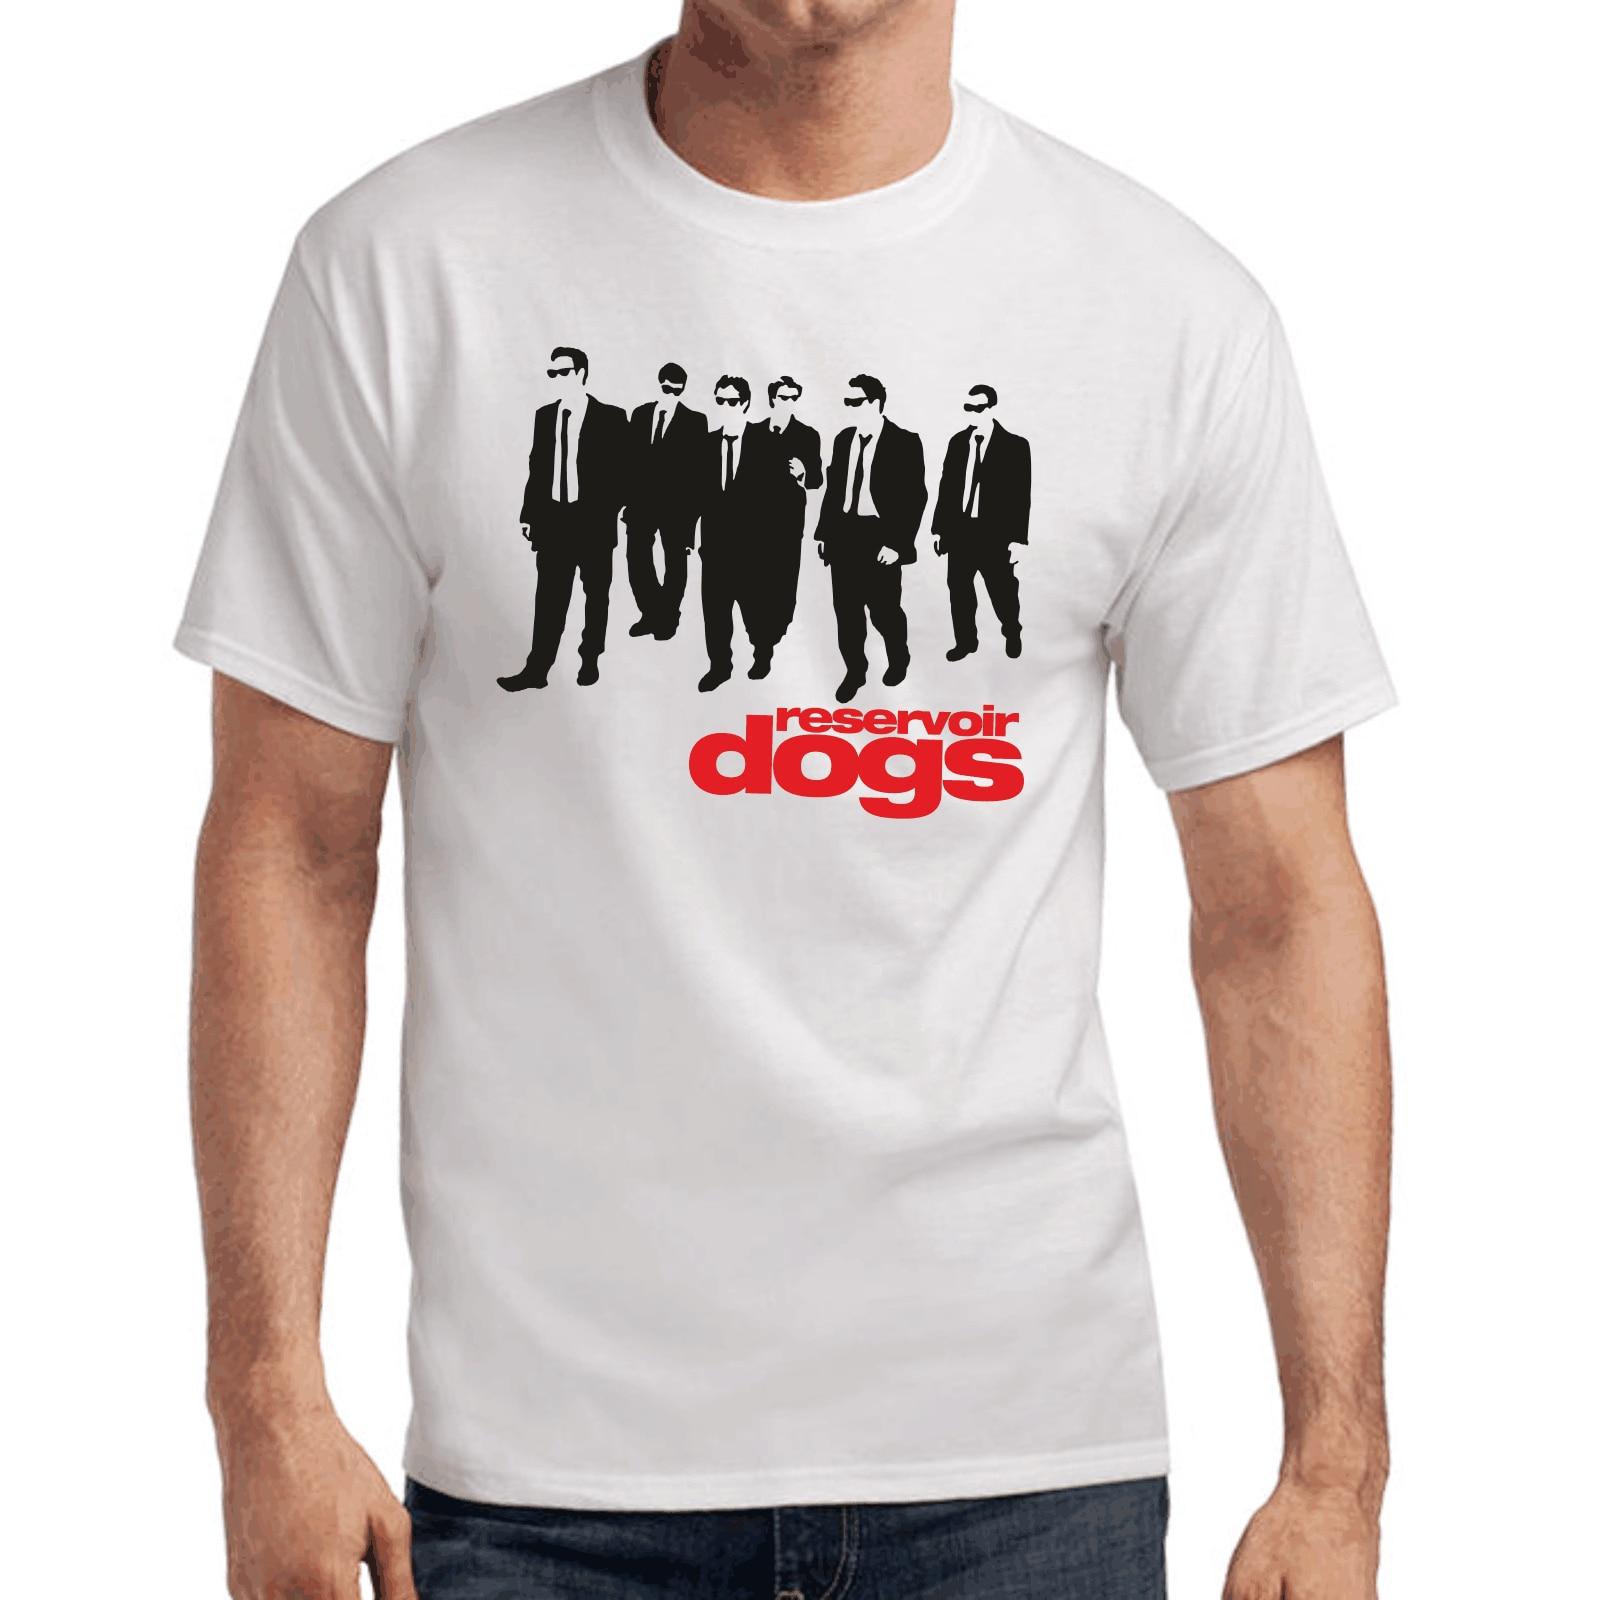 Reservoir Dogs Quentin Tarantino Culte Movie Retro Fan Fanshirt Stencil T-Shirt